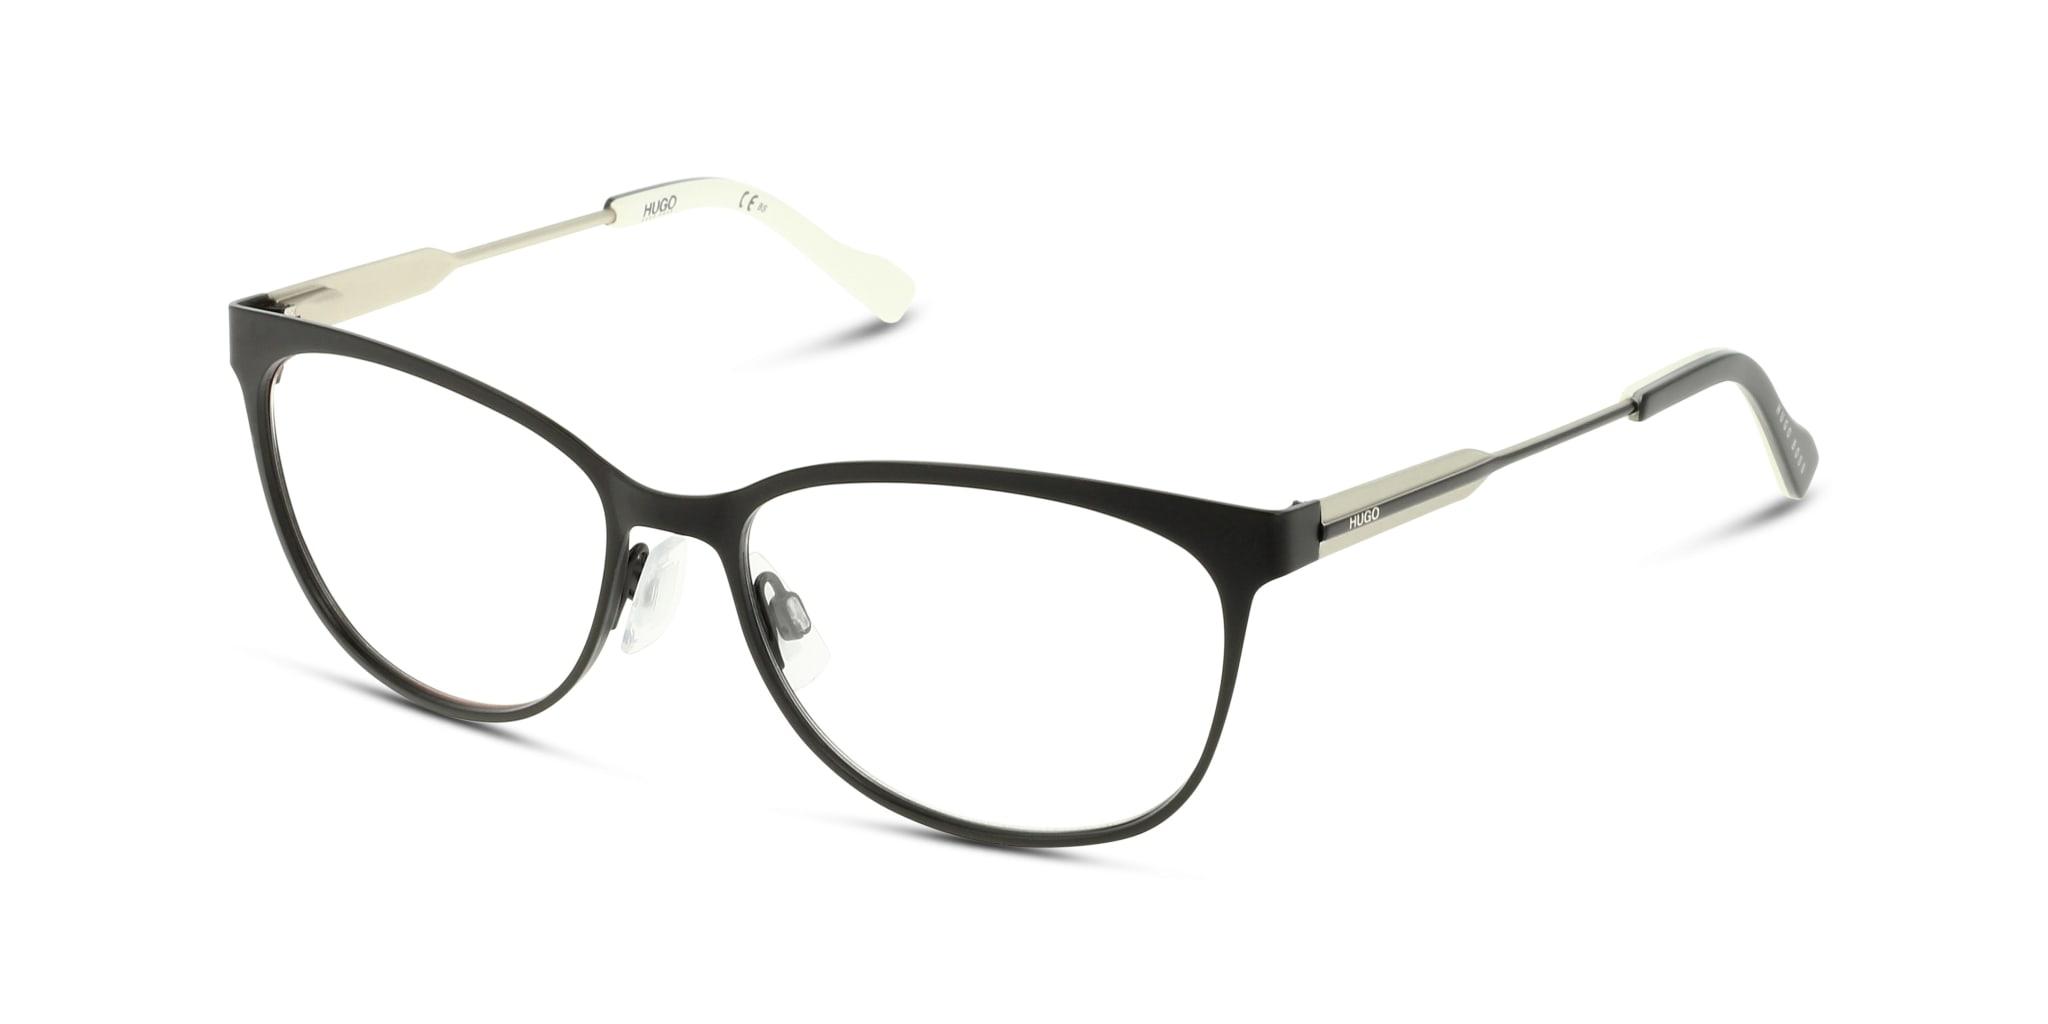 716736095981-angle-03-hugo-hg_0233-eyewear-mtt-black